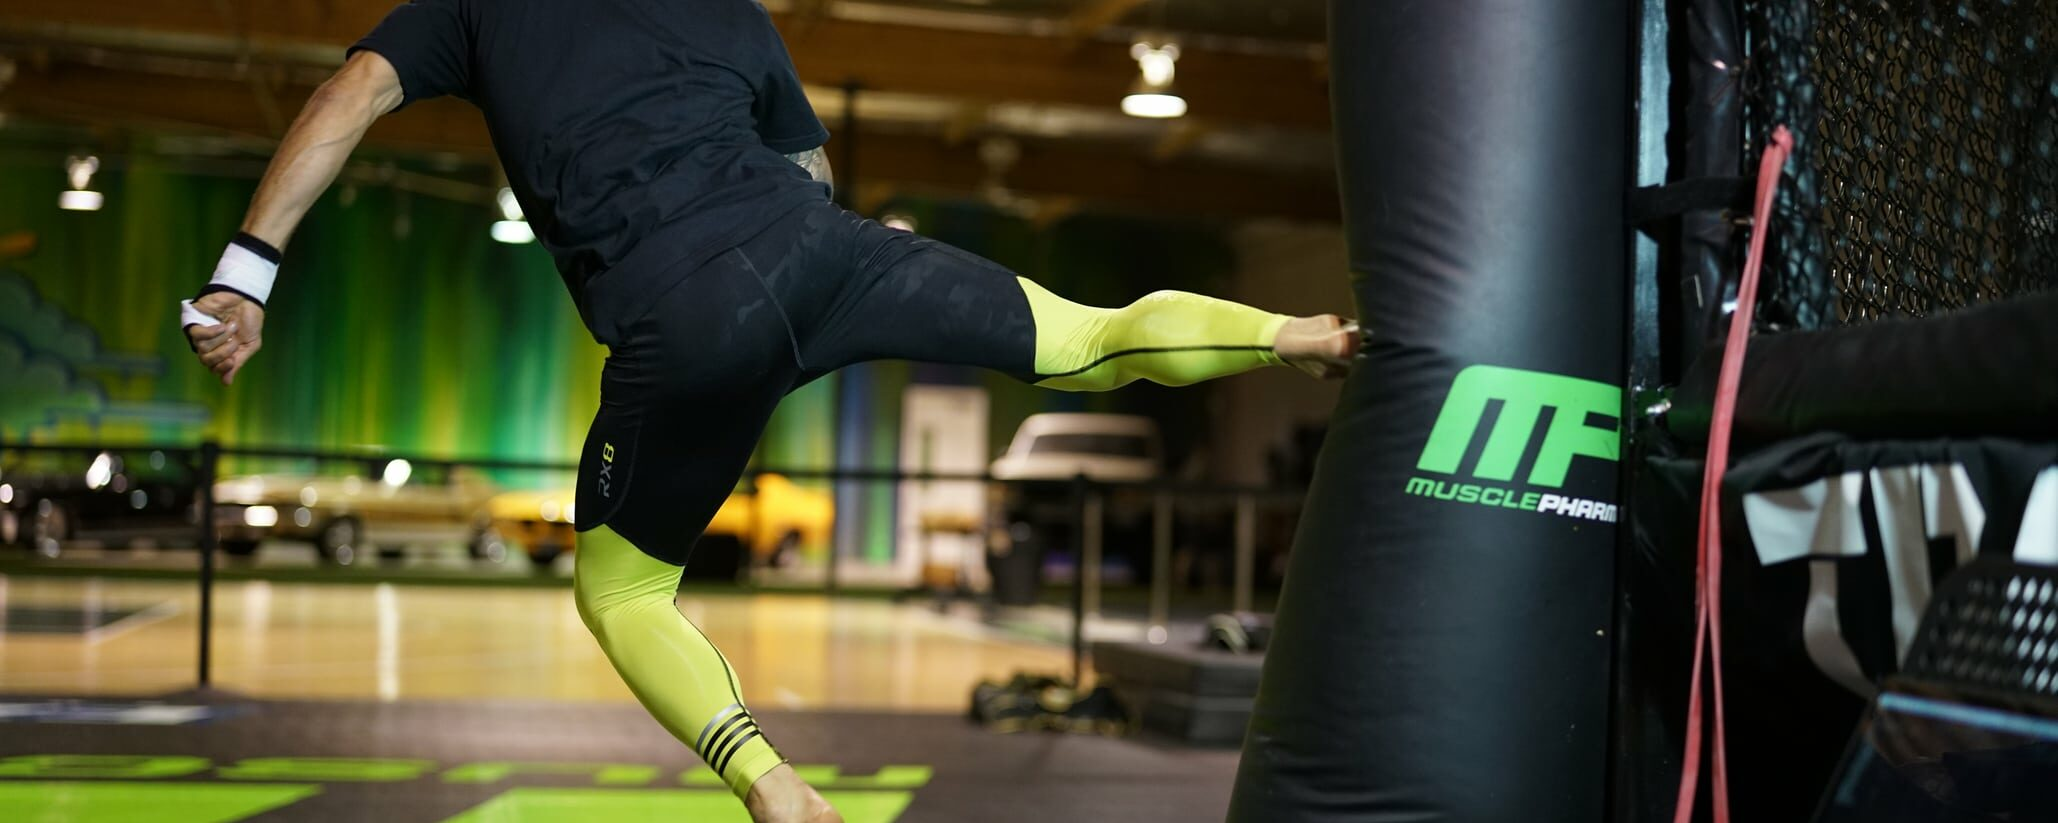 How to Improve Kicks